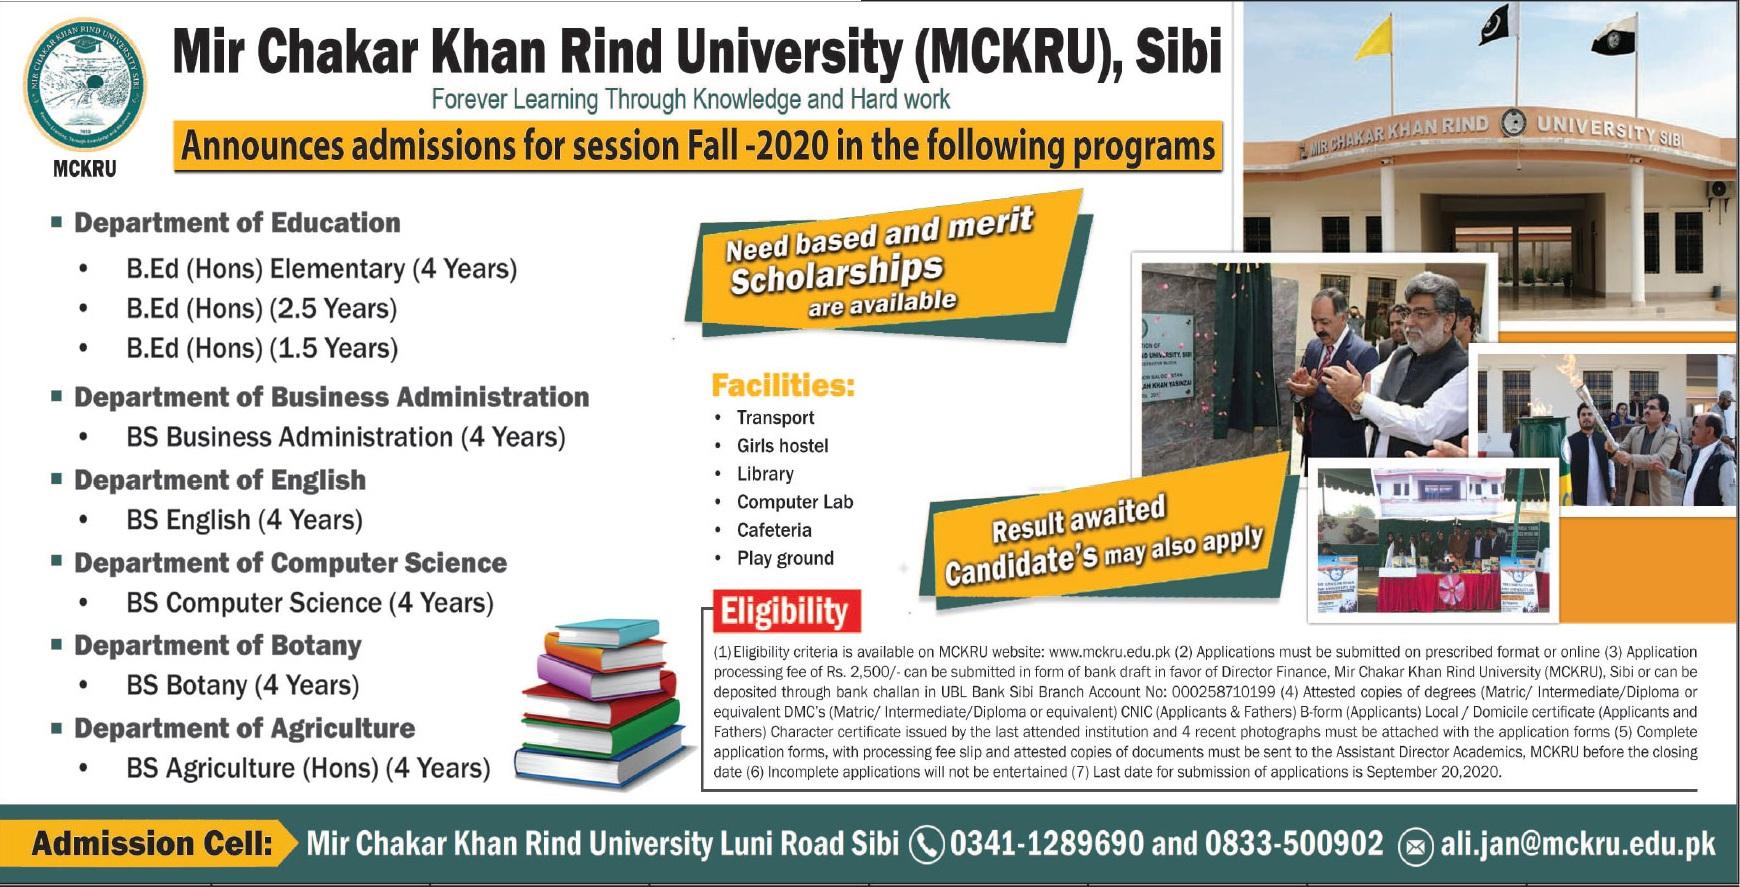 Mir Chakar Khan Rind University Sibi Admissions